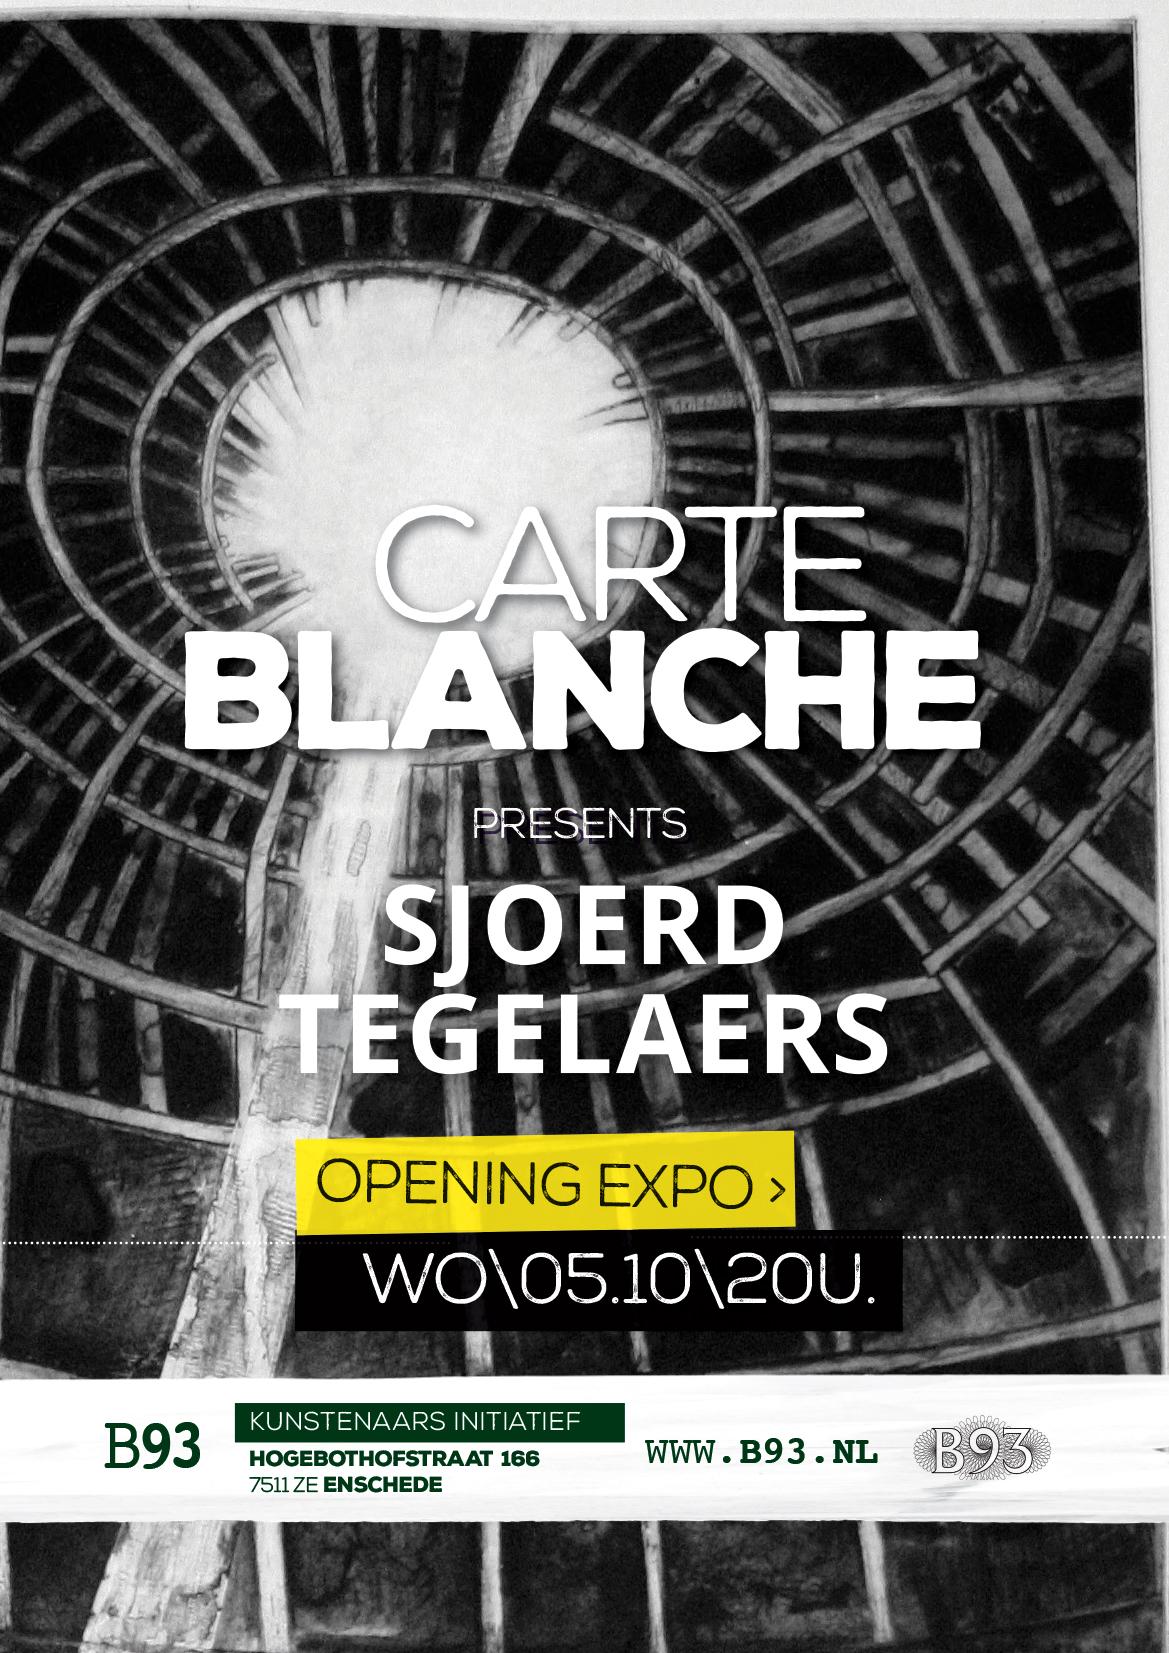 Carte Blanche – Sjoerd Tegelaers